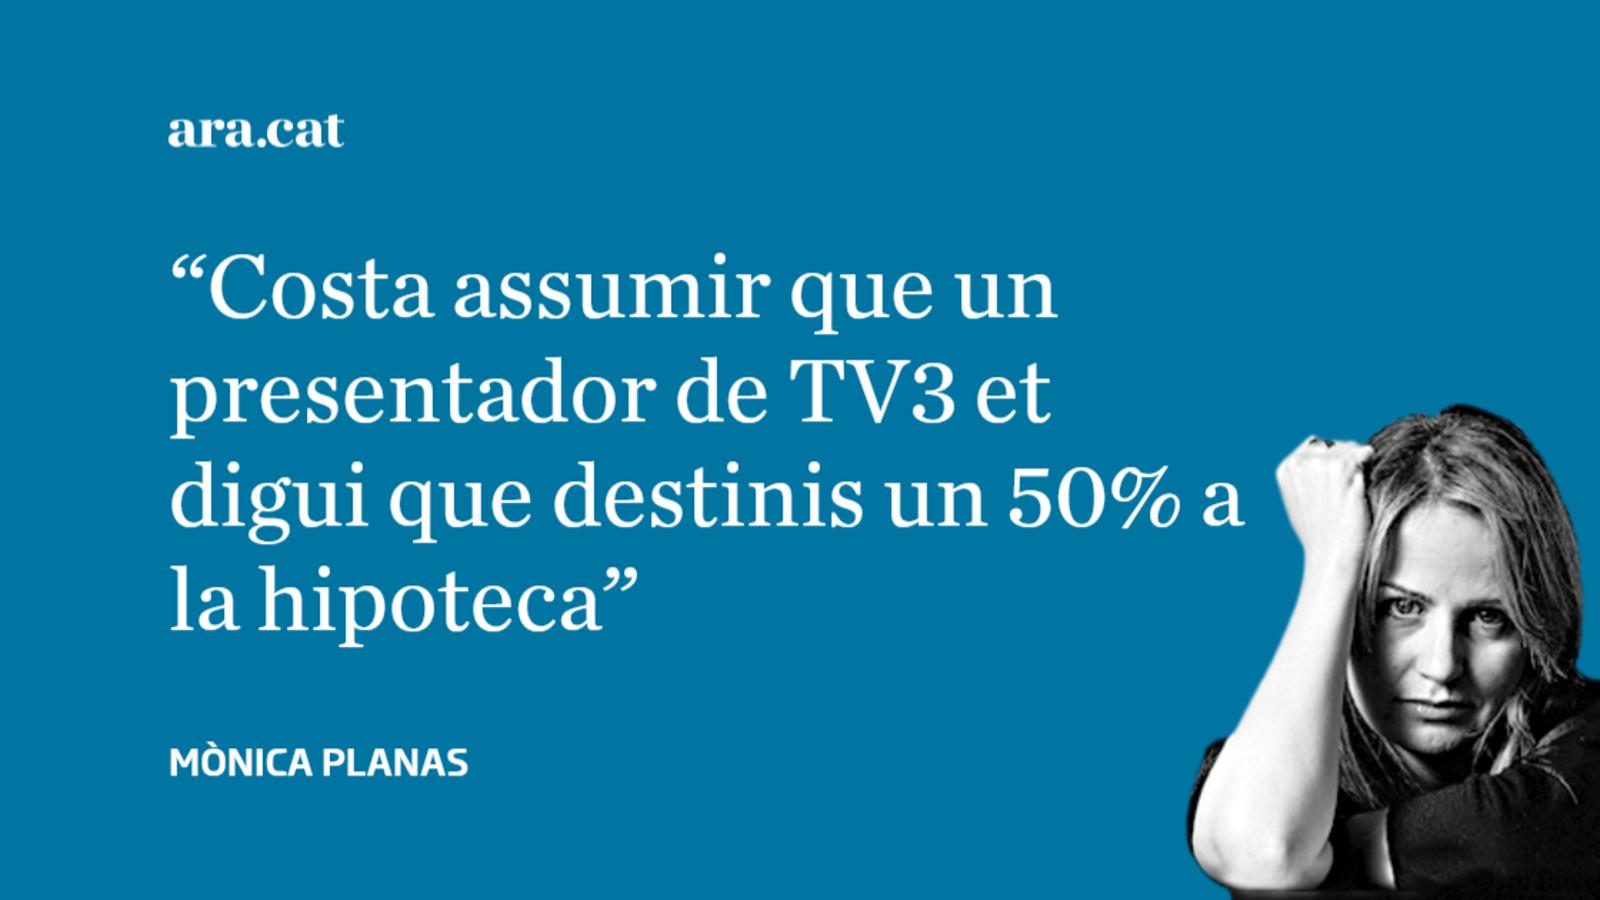 La hipoteca de TV3